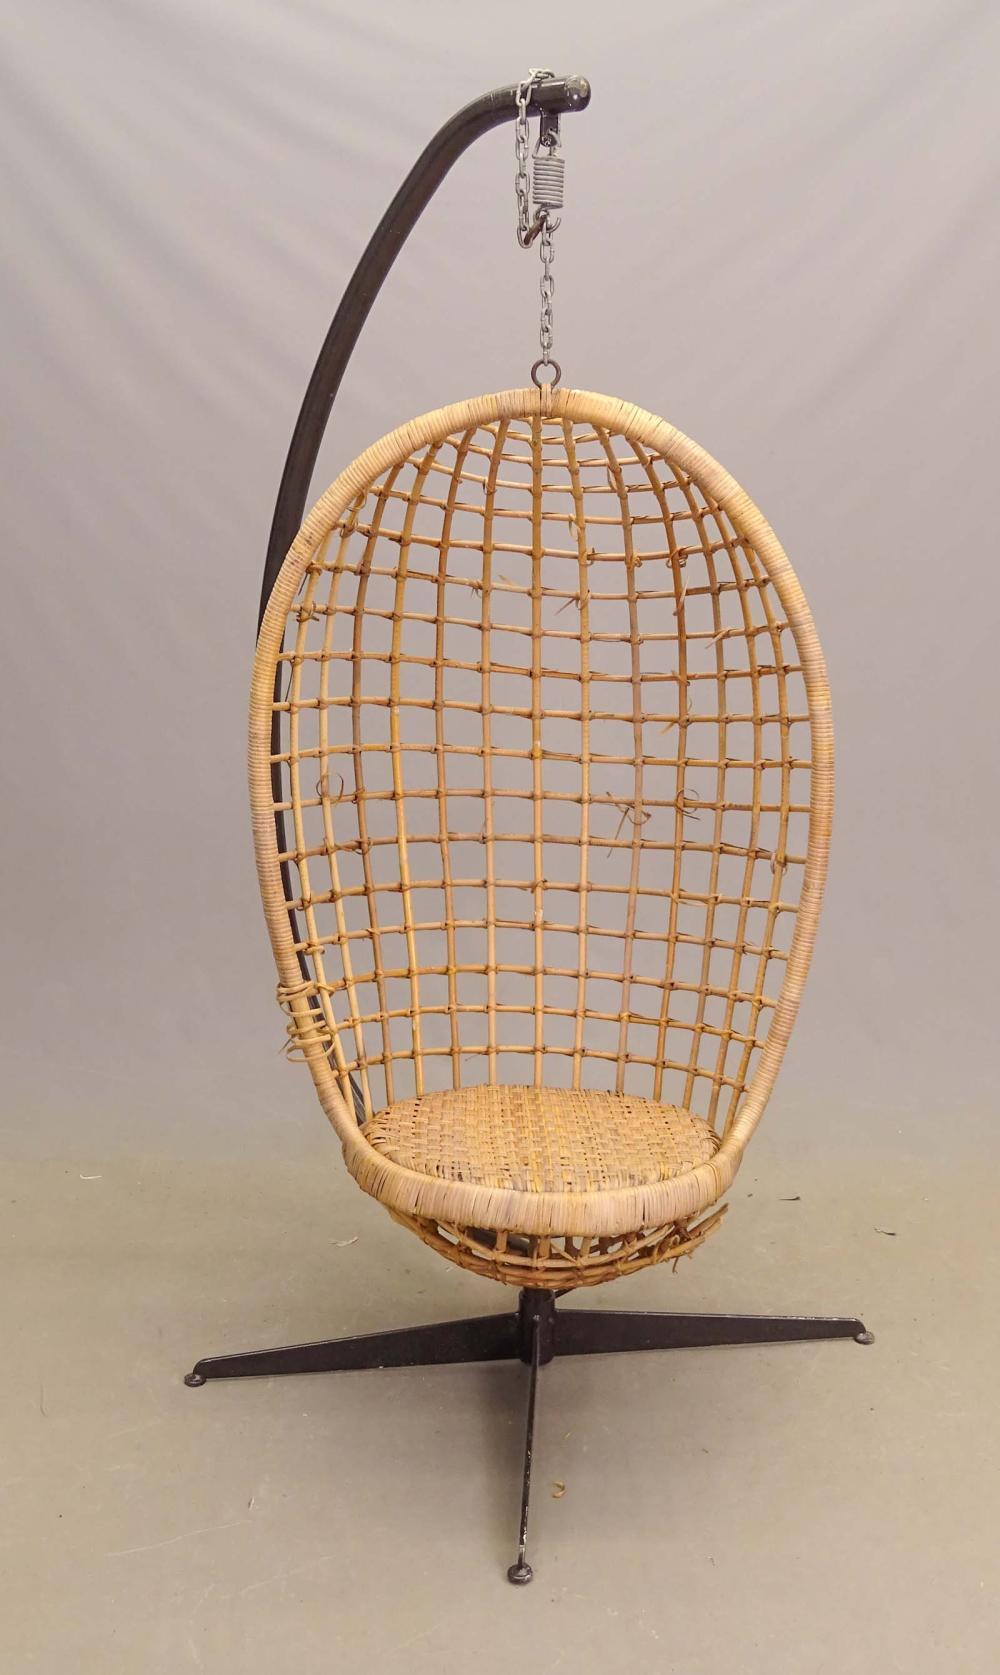 Vintage Rattan Egg Chair